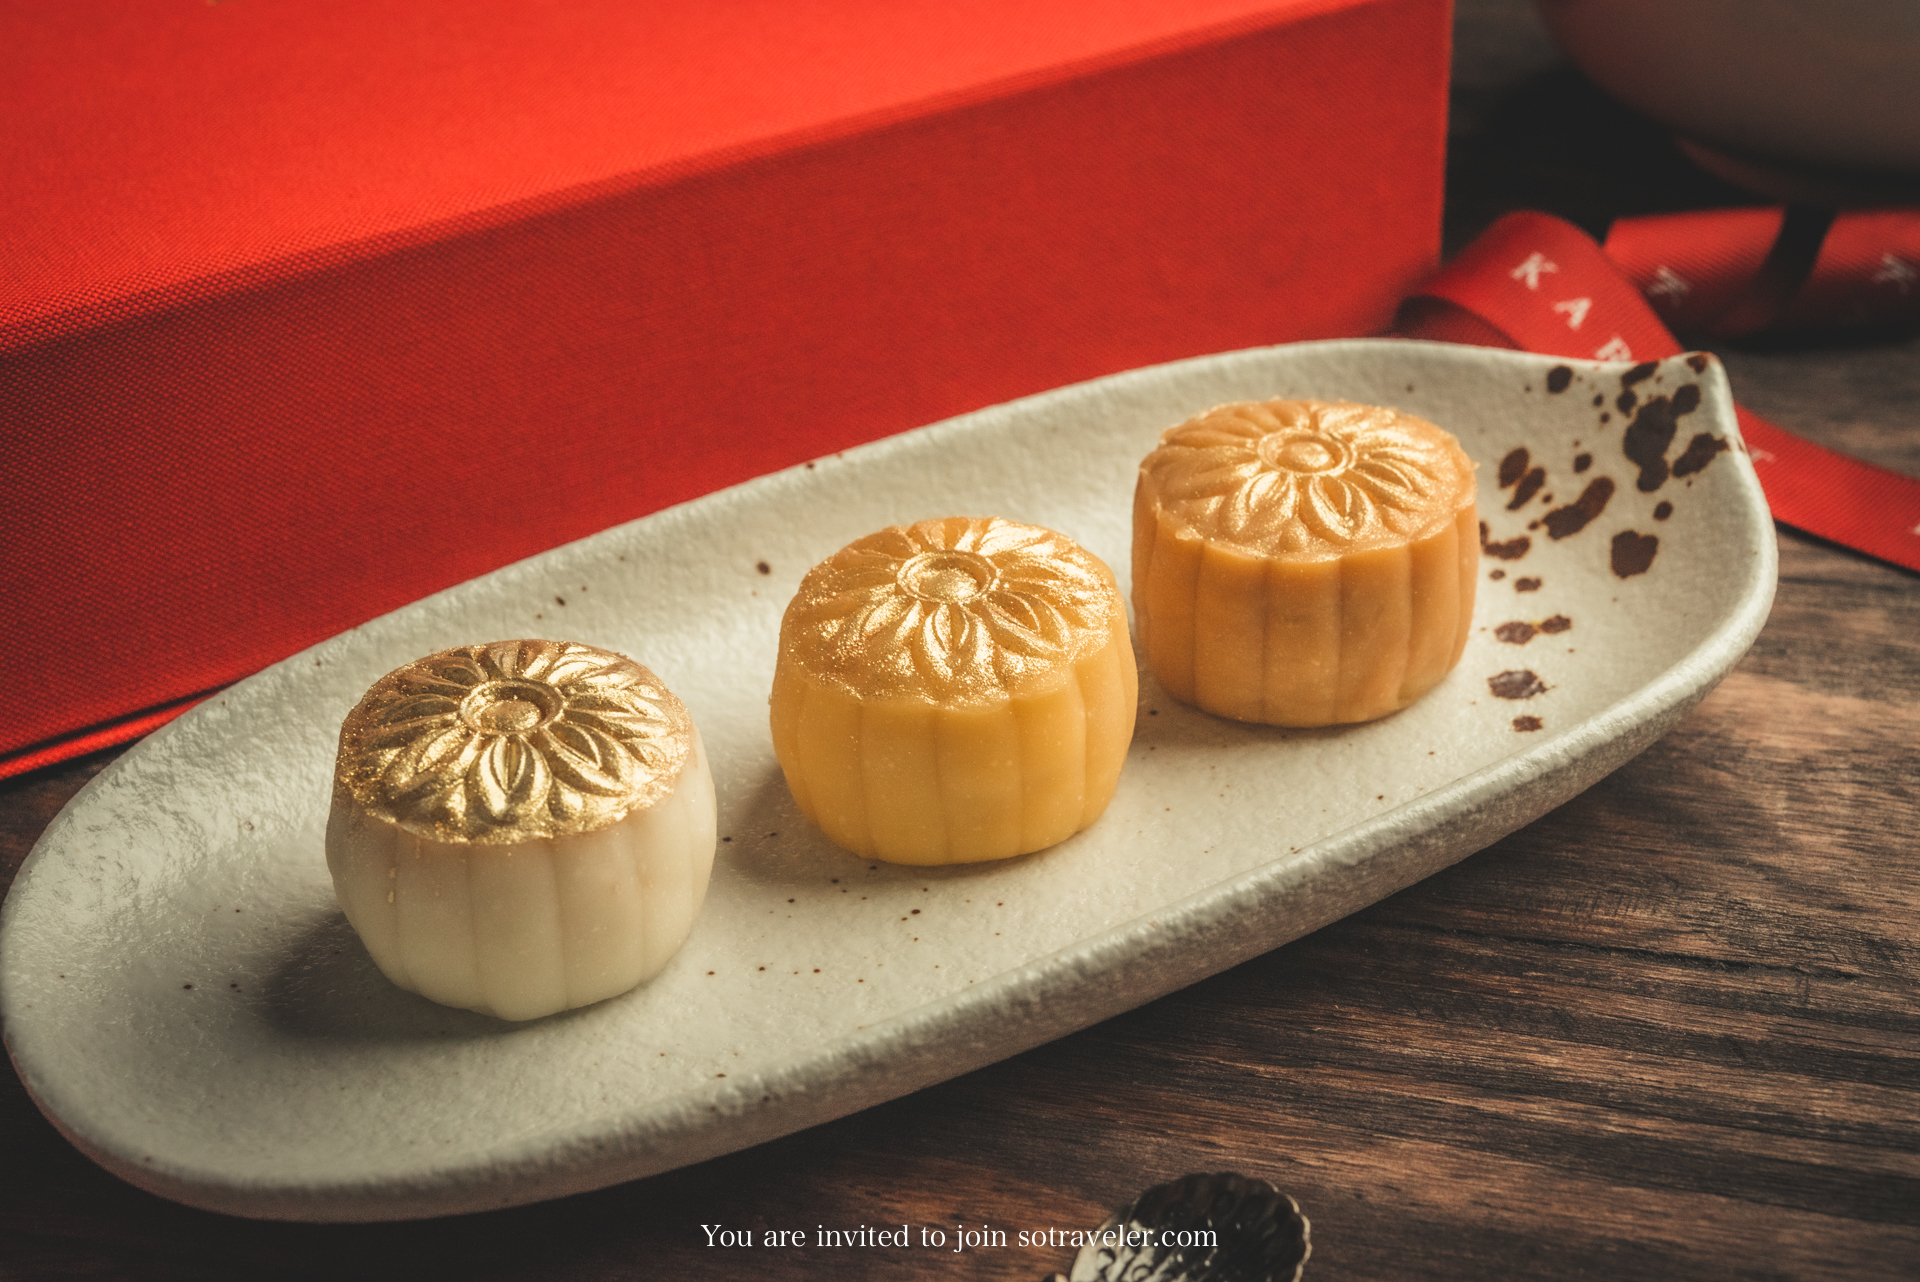 KARRAT's luxurious mooncake